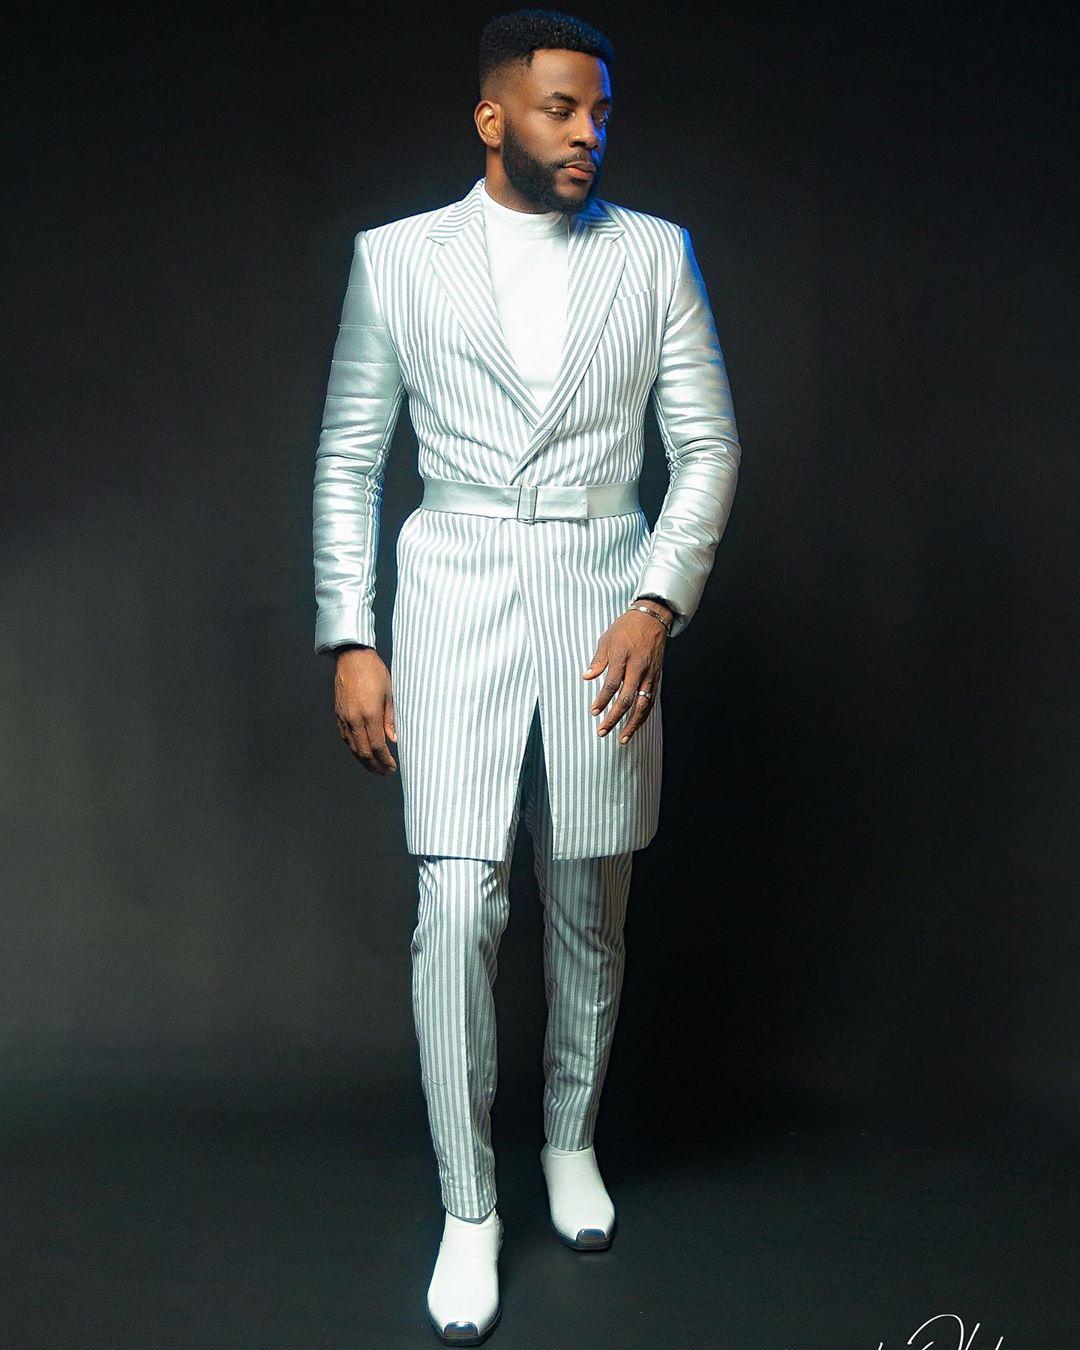 ebuka-bbnaija-male-celebrities-street-style-best-dressed-african-men